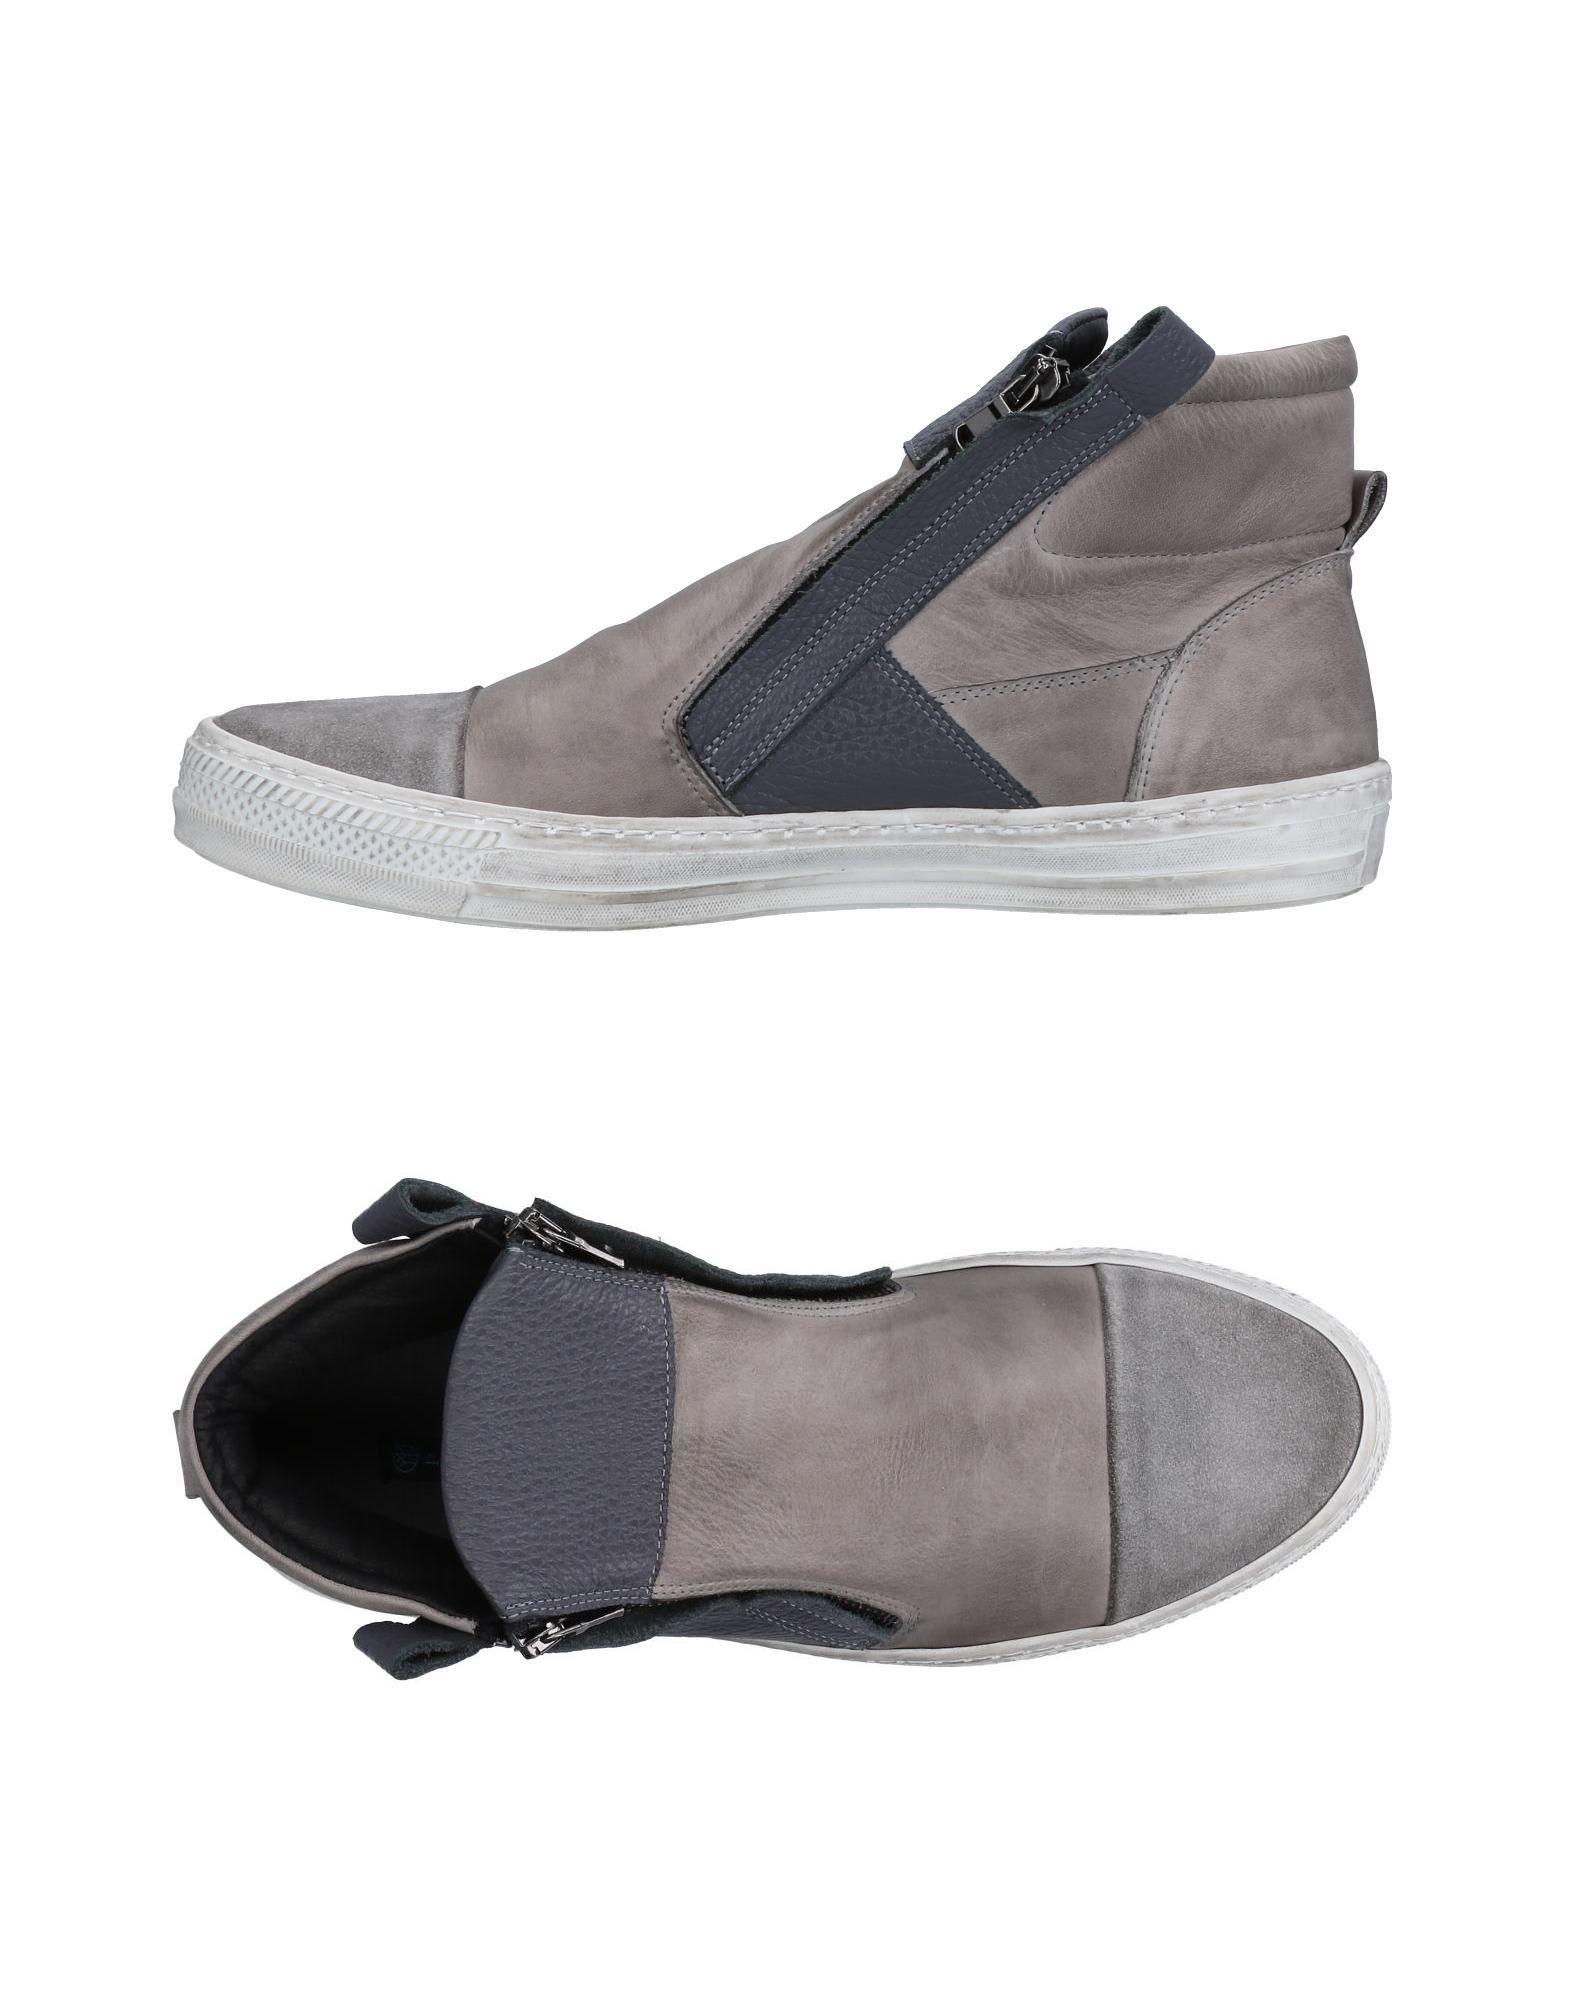 Primo Emporio Sneakers - Men on Primo Emporio Sneakers online on Men  United Kingdom - 11514973HH aba5d0